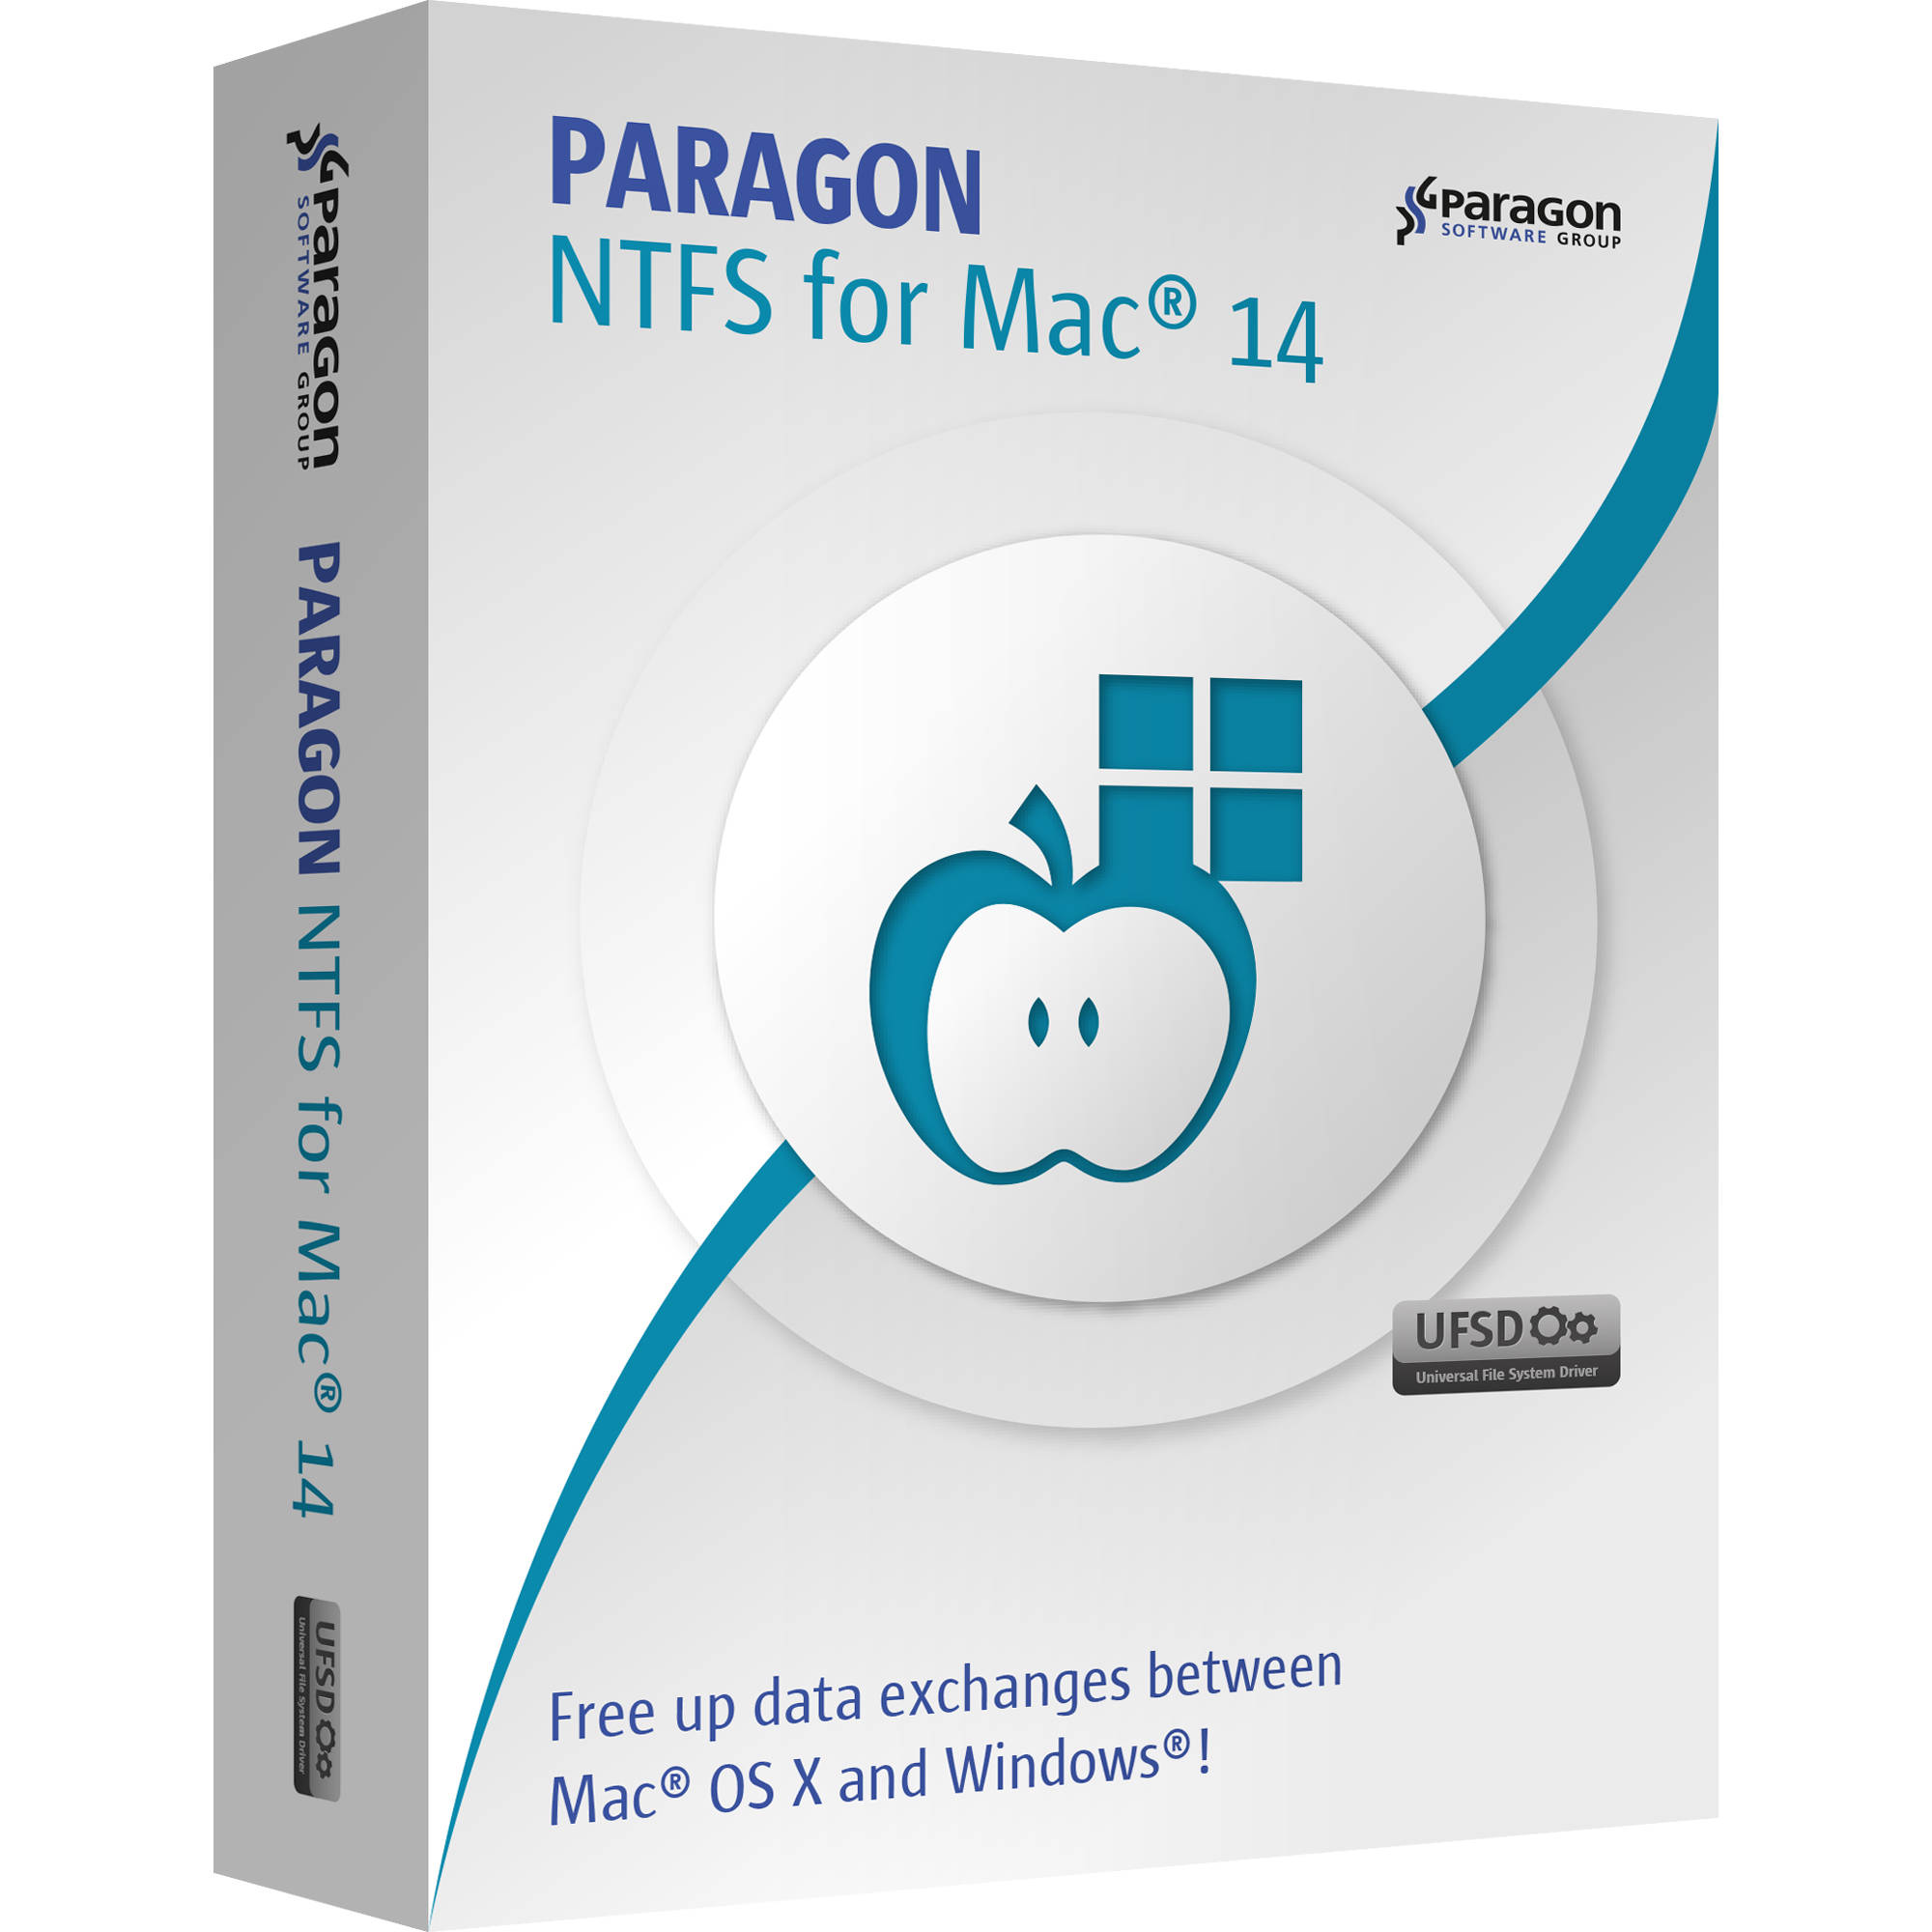 Ntfs-3g 2017. 3. 23 free download for mac   macupdate.